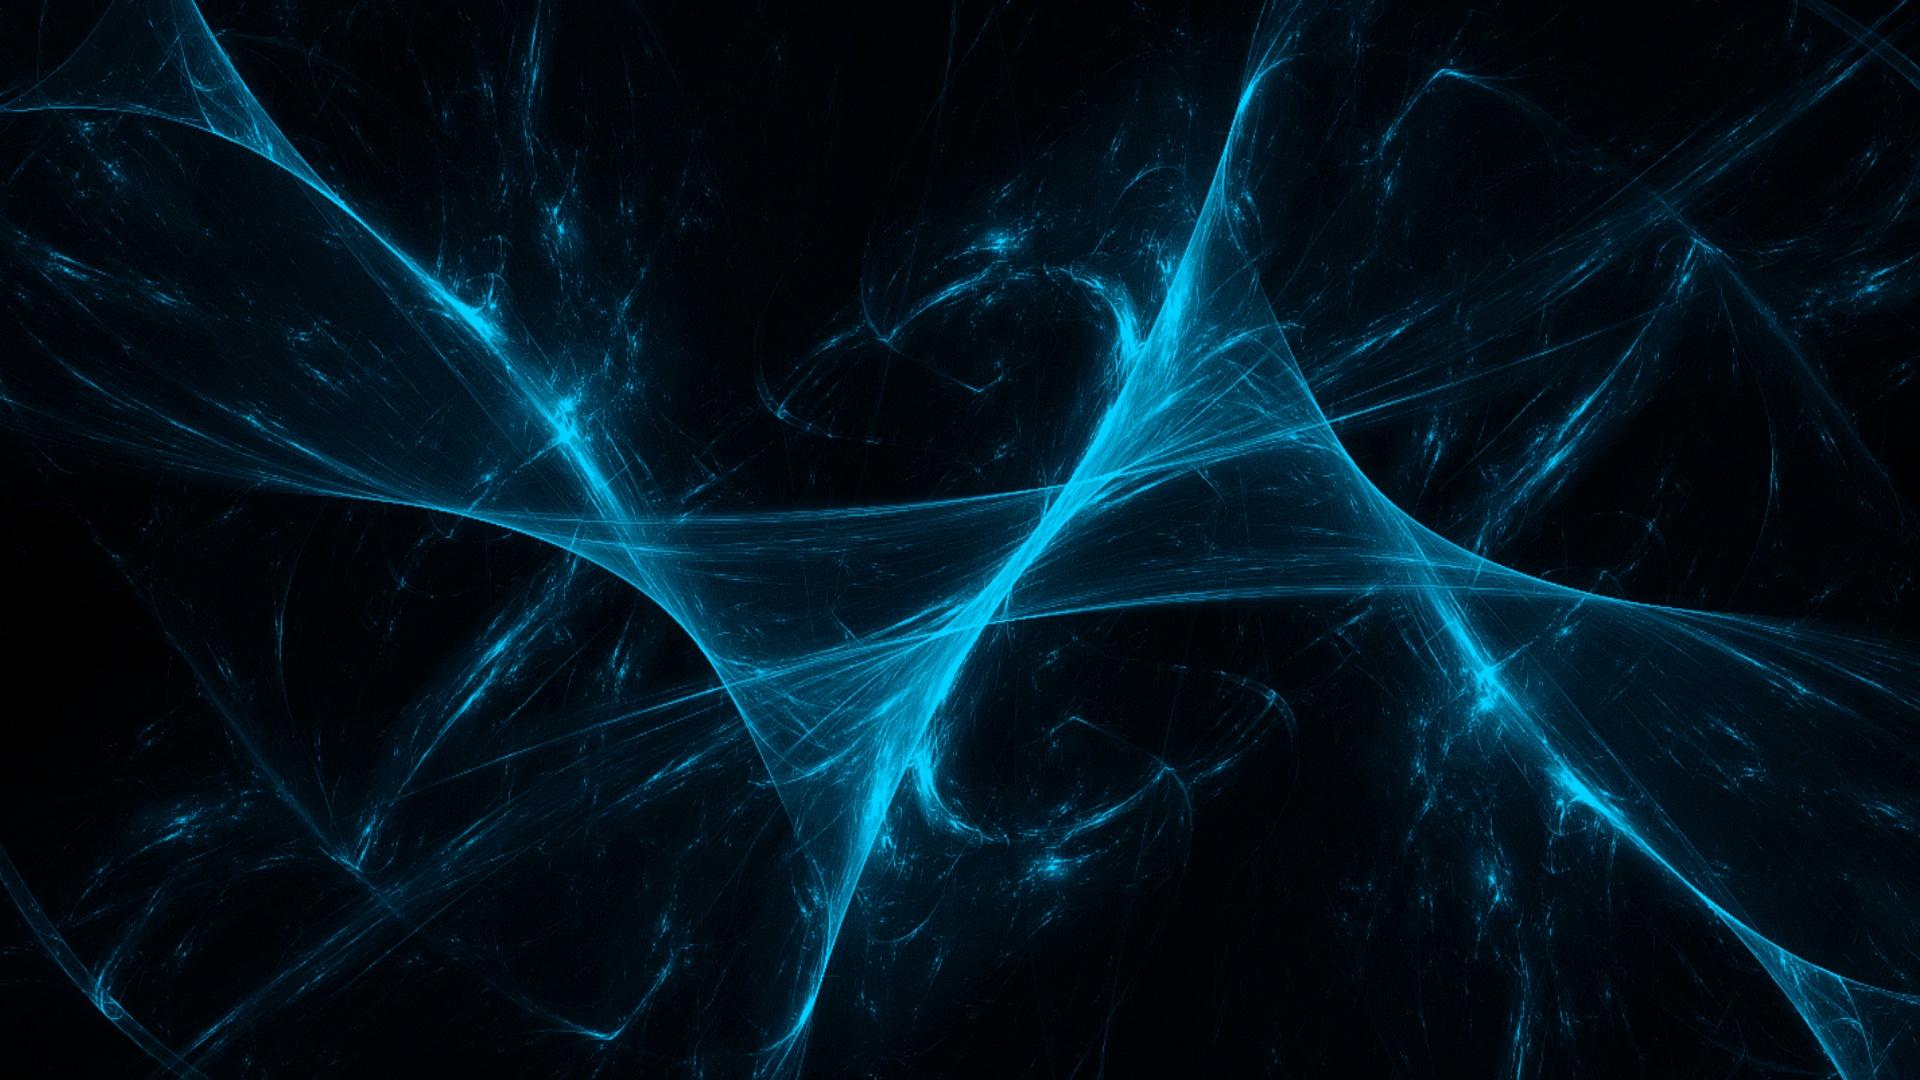 Blue Dark Abstract Image Wallpaper WallpaperLepi 1920x1080